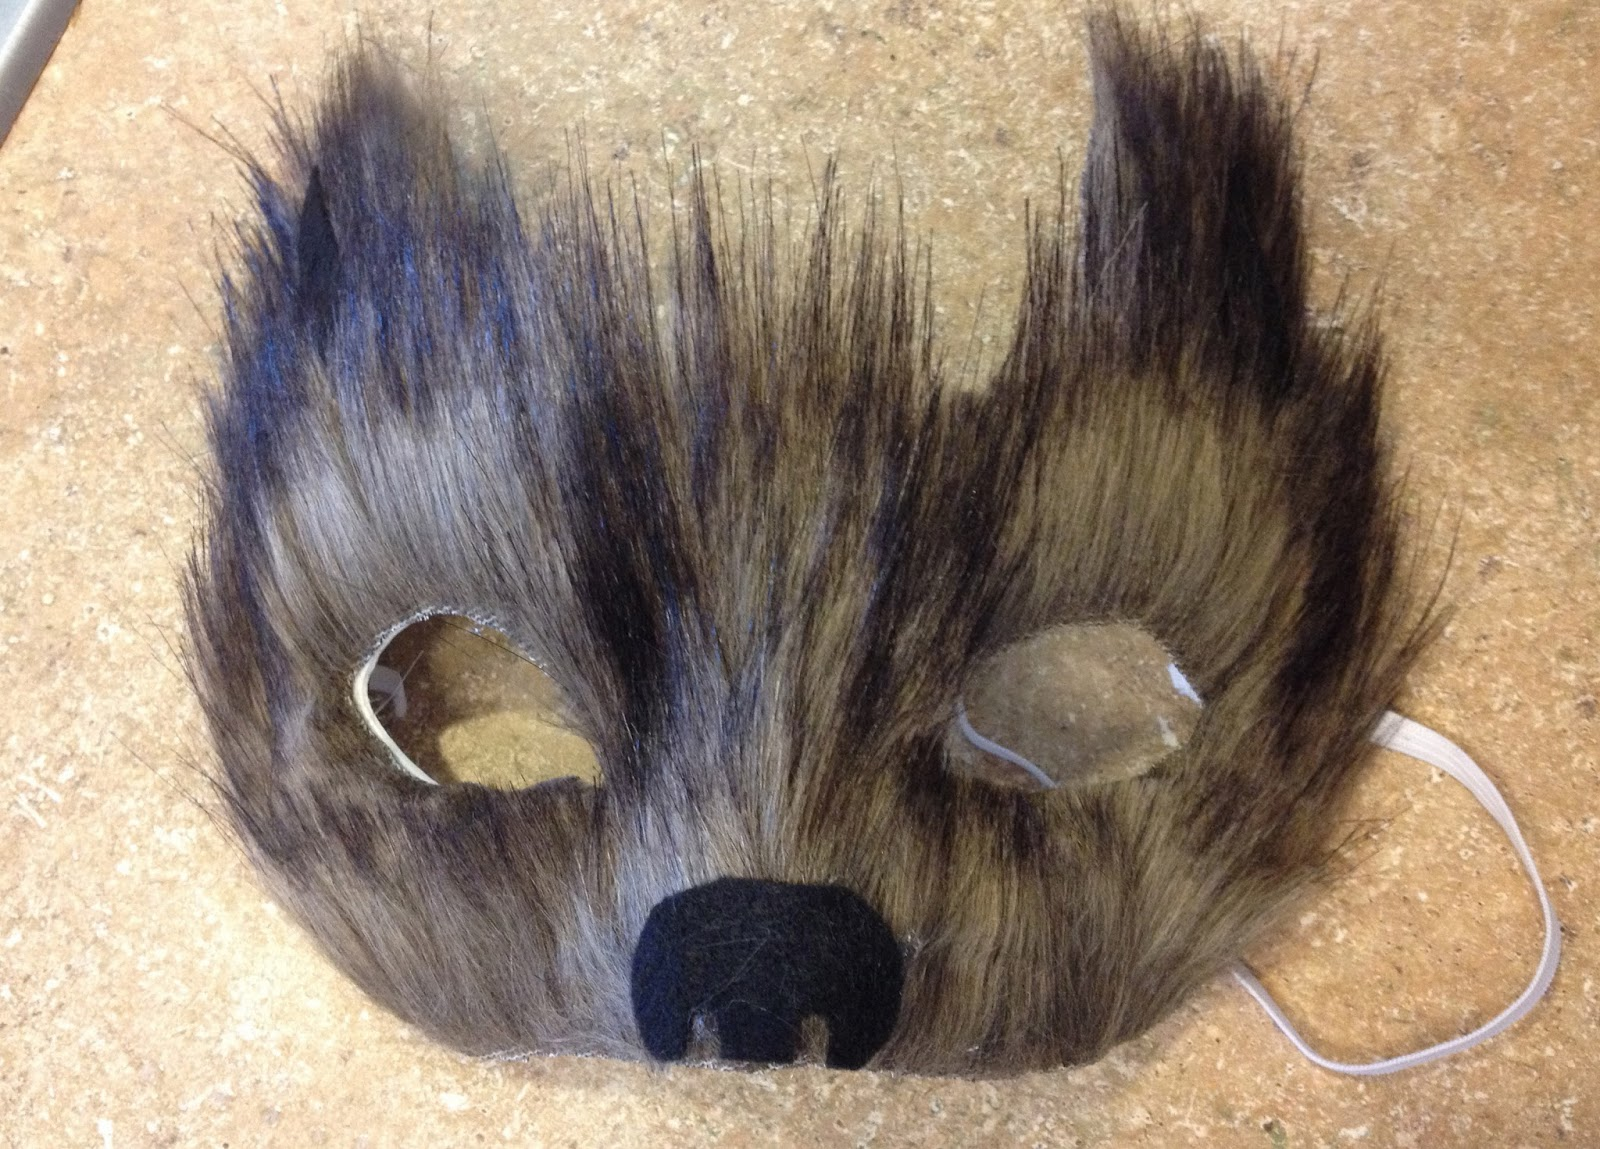 Diy big bad wolf costume - photo#7